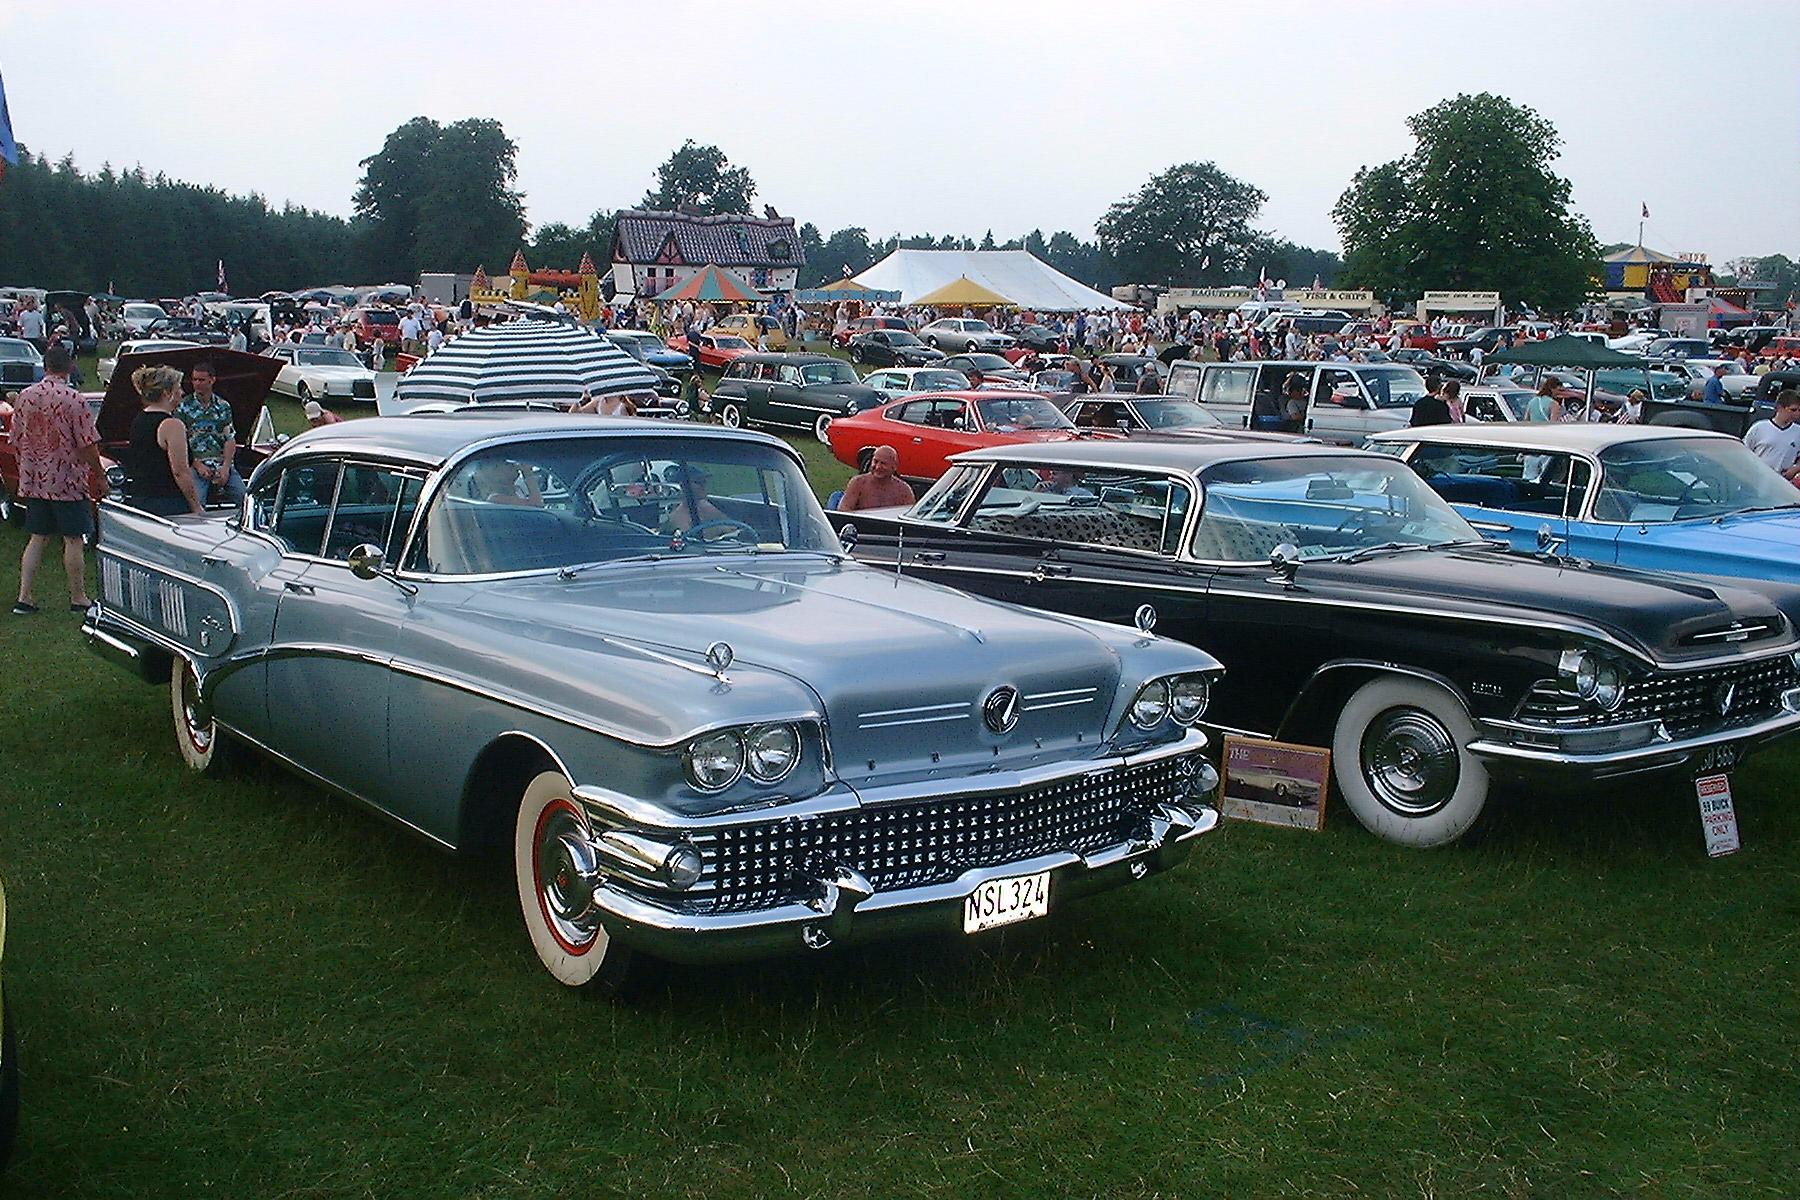 Tatton Park Car Show July